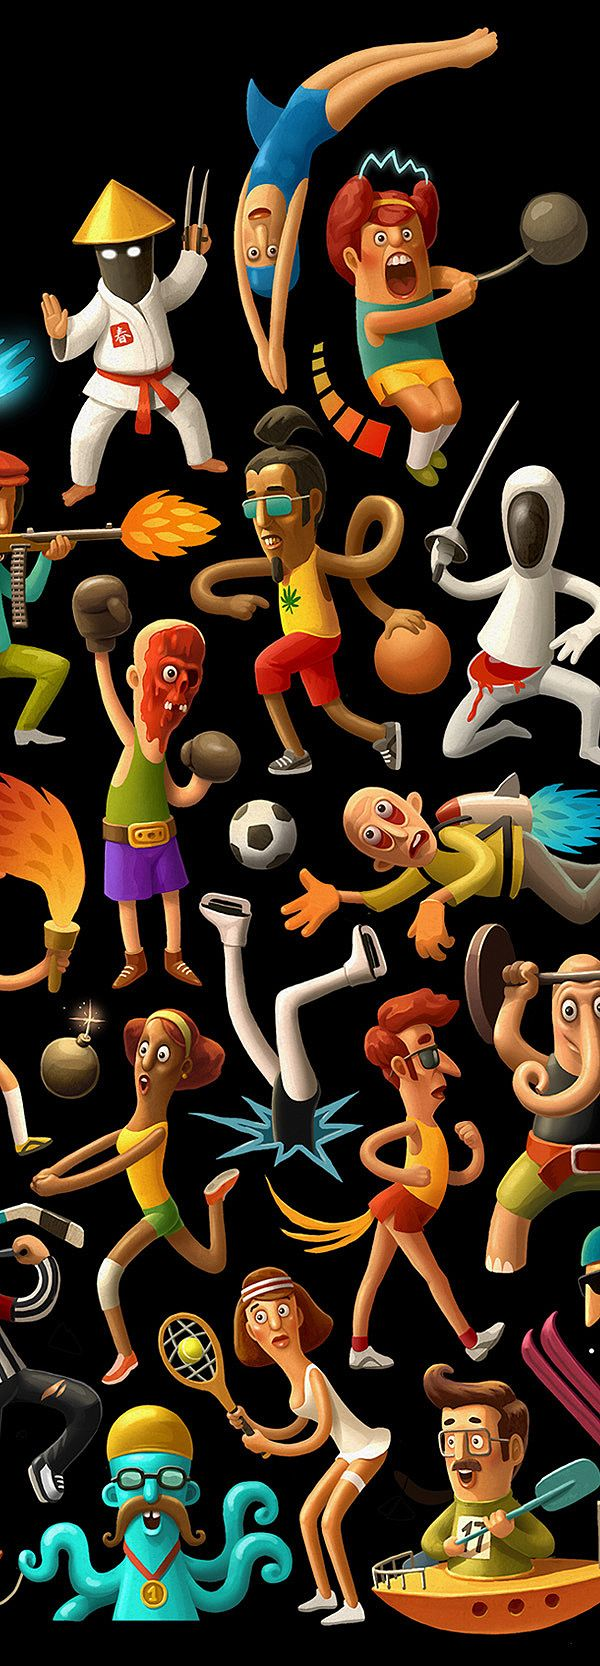 SPORT artwork by Andrey Gordeev, via Behance★ Find more at http://www.pinterest.com/competing/